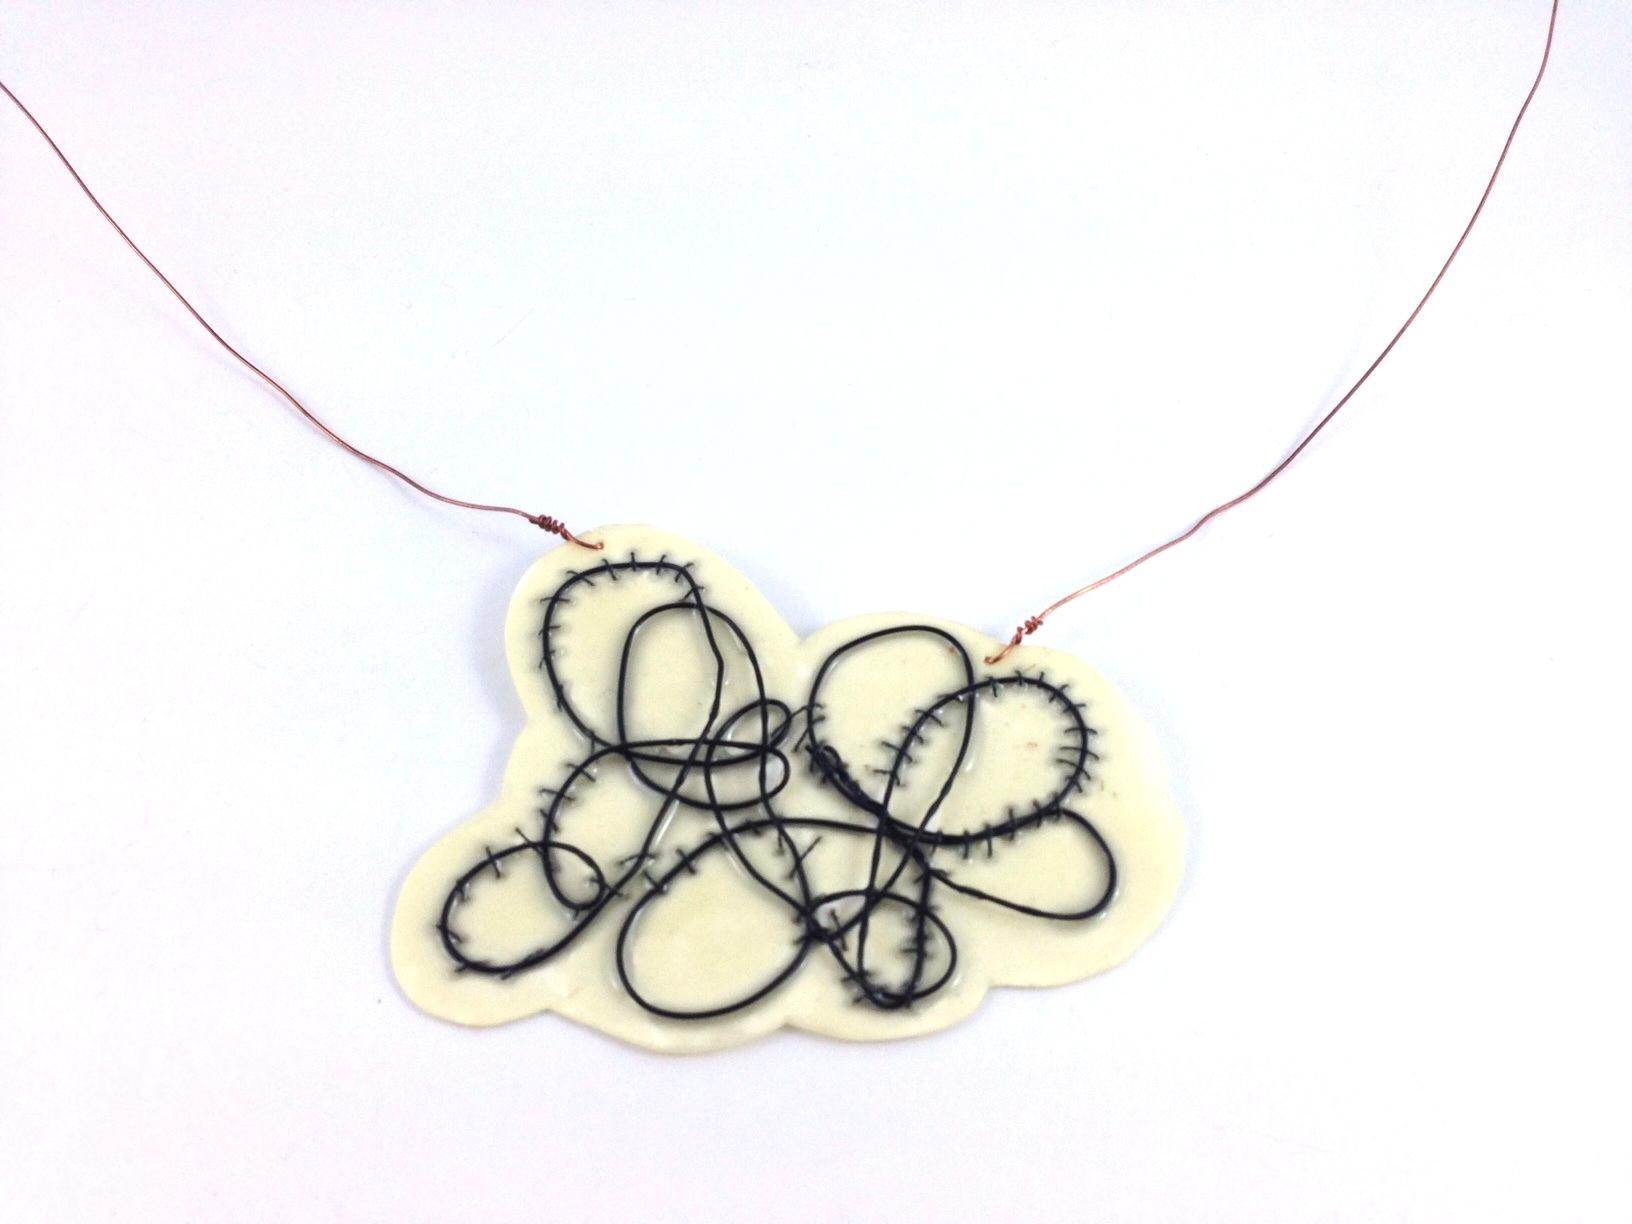 Stitched Tornado Necklace Closeup.jpg